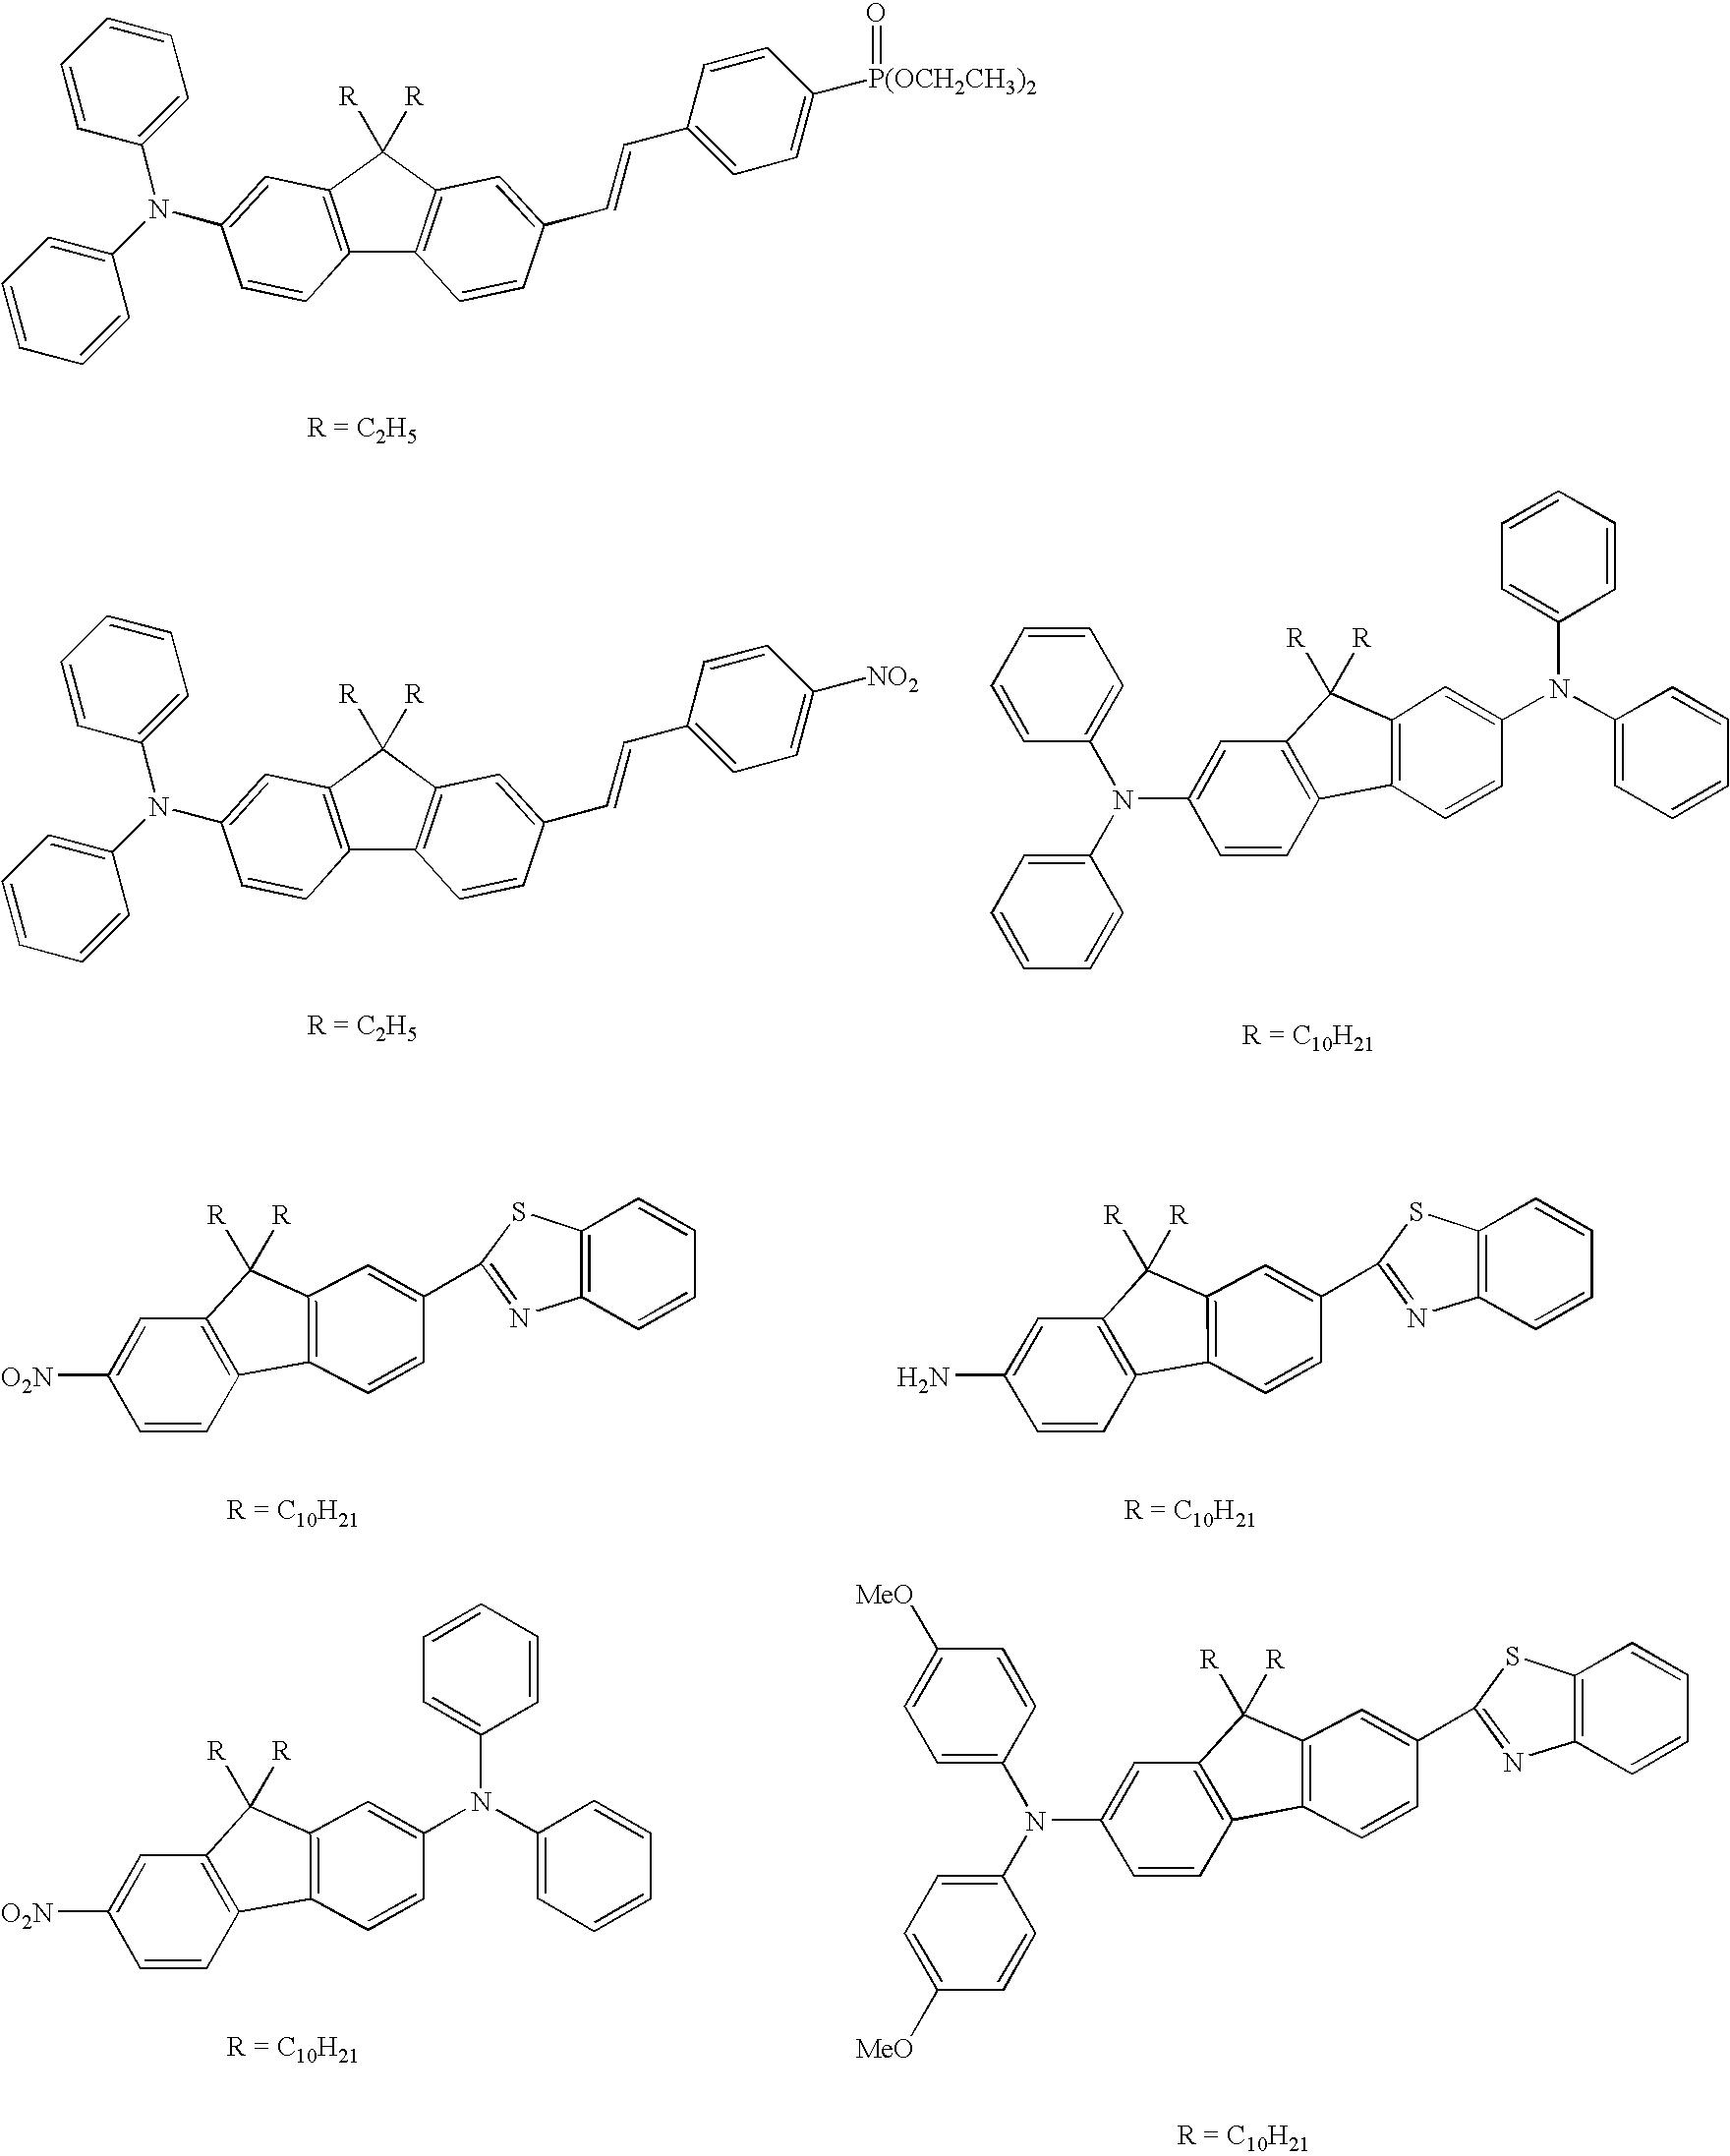 Multipass Multiphoton Absorption Method